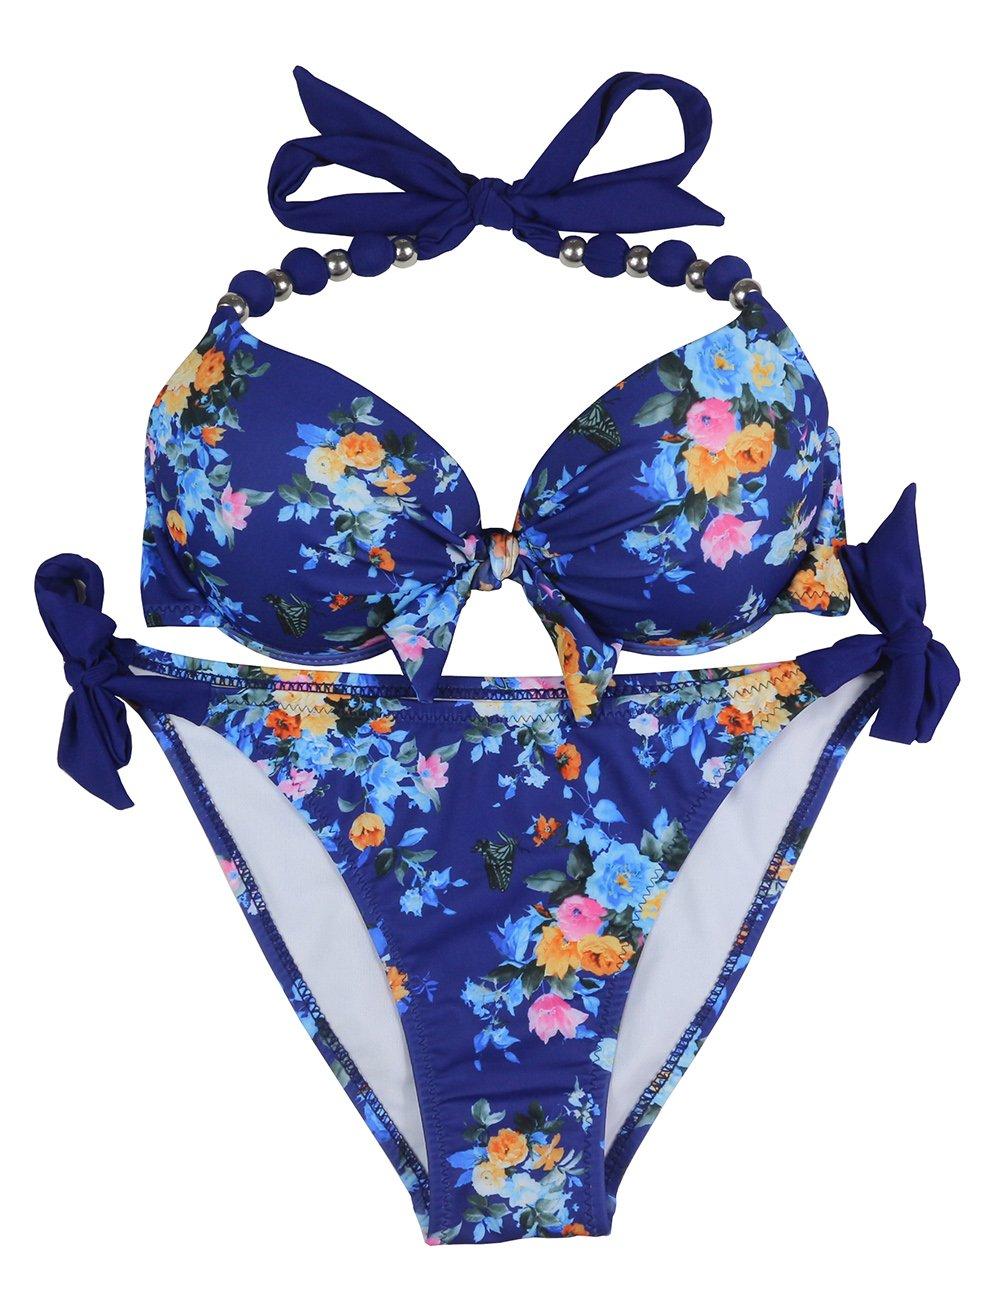 EONAR Womens Halter Swimwear Removable Push up Pad Bikini Set